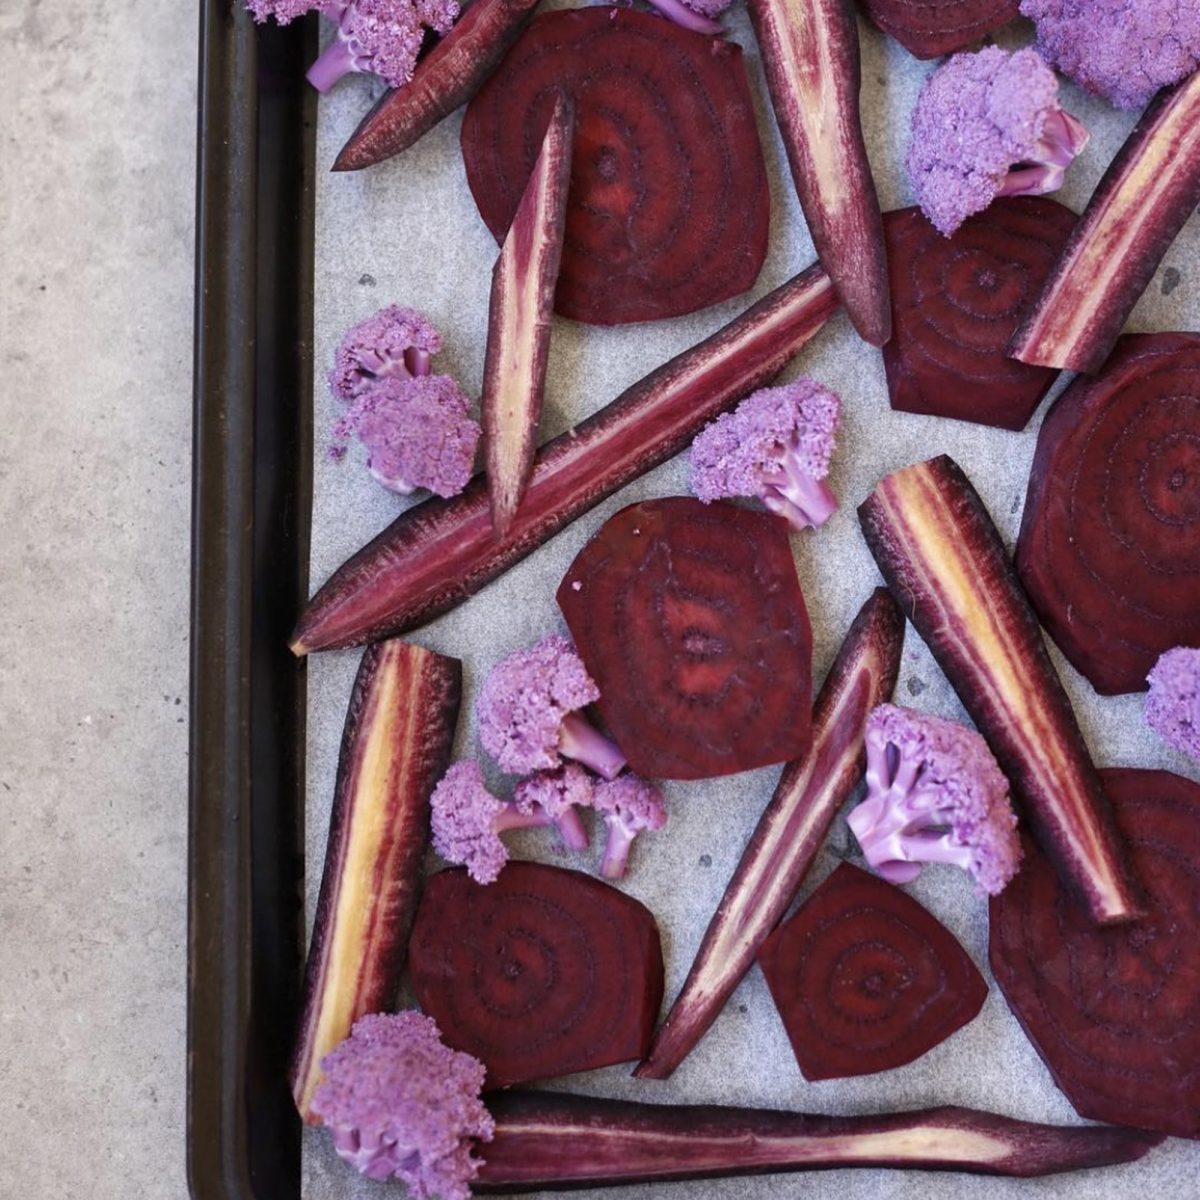 Purple veggies for baking